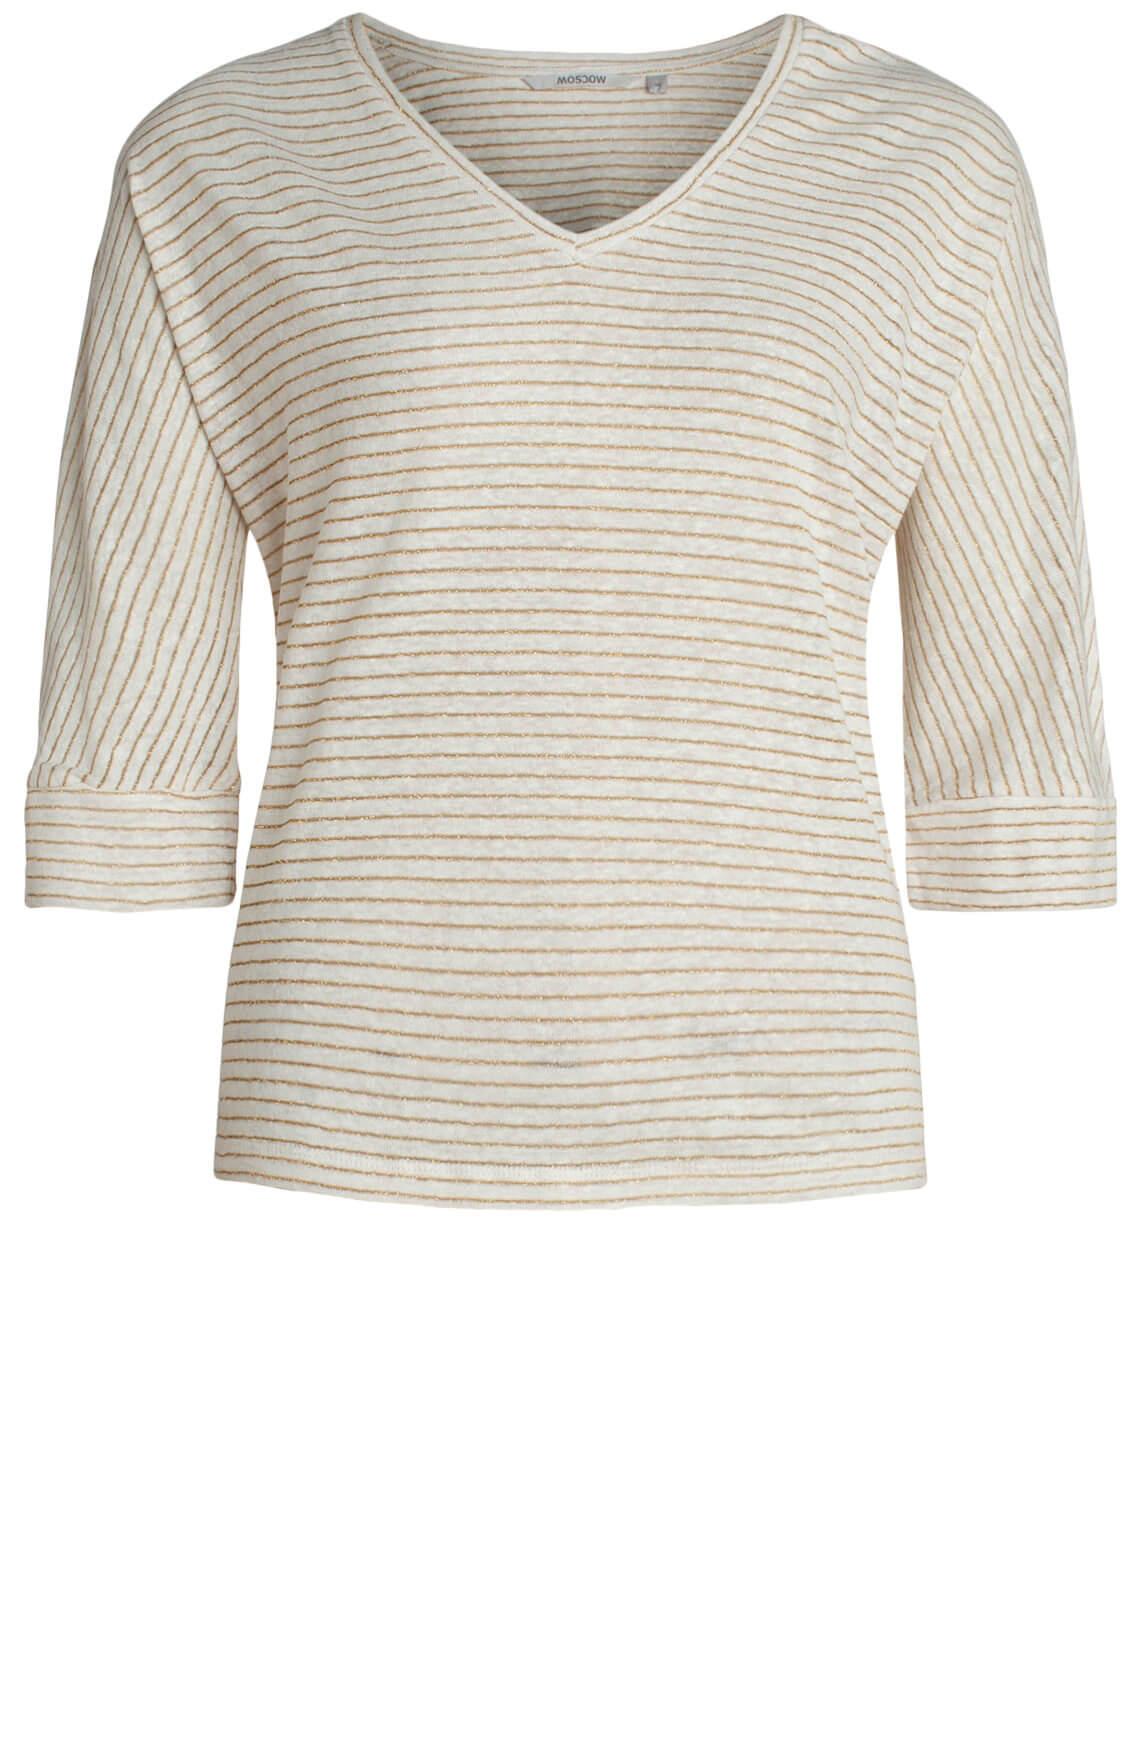 Moscow Dames Shirt met lurex wit